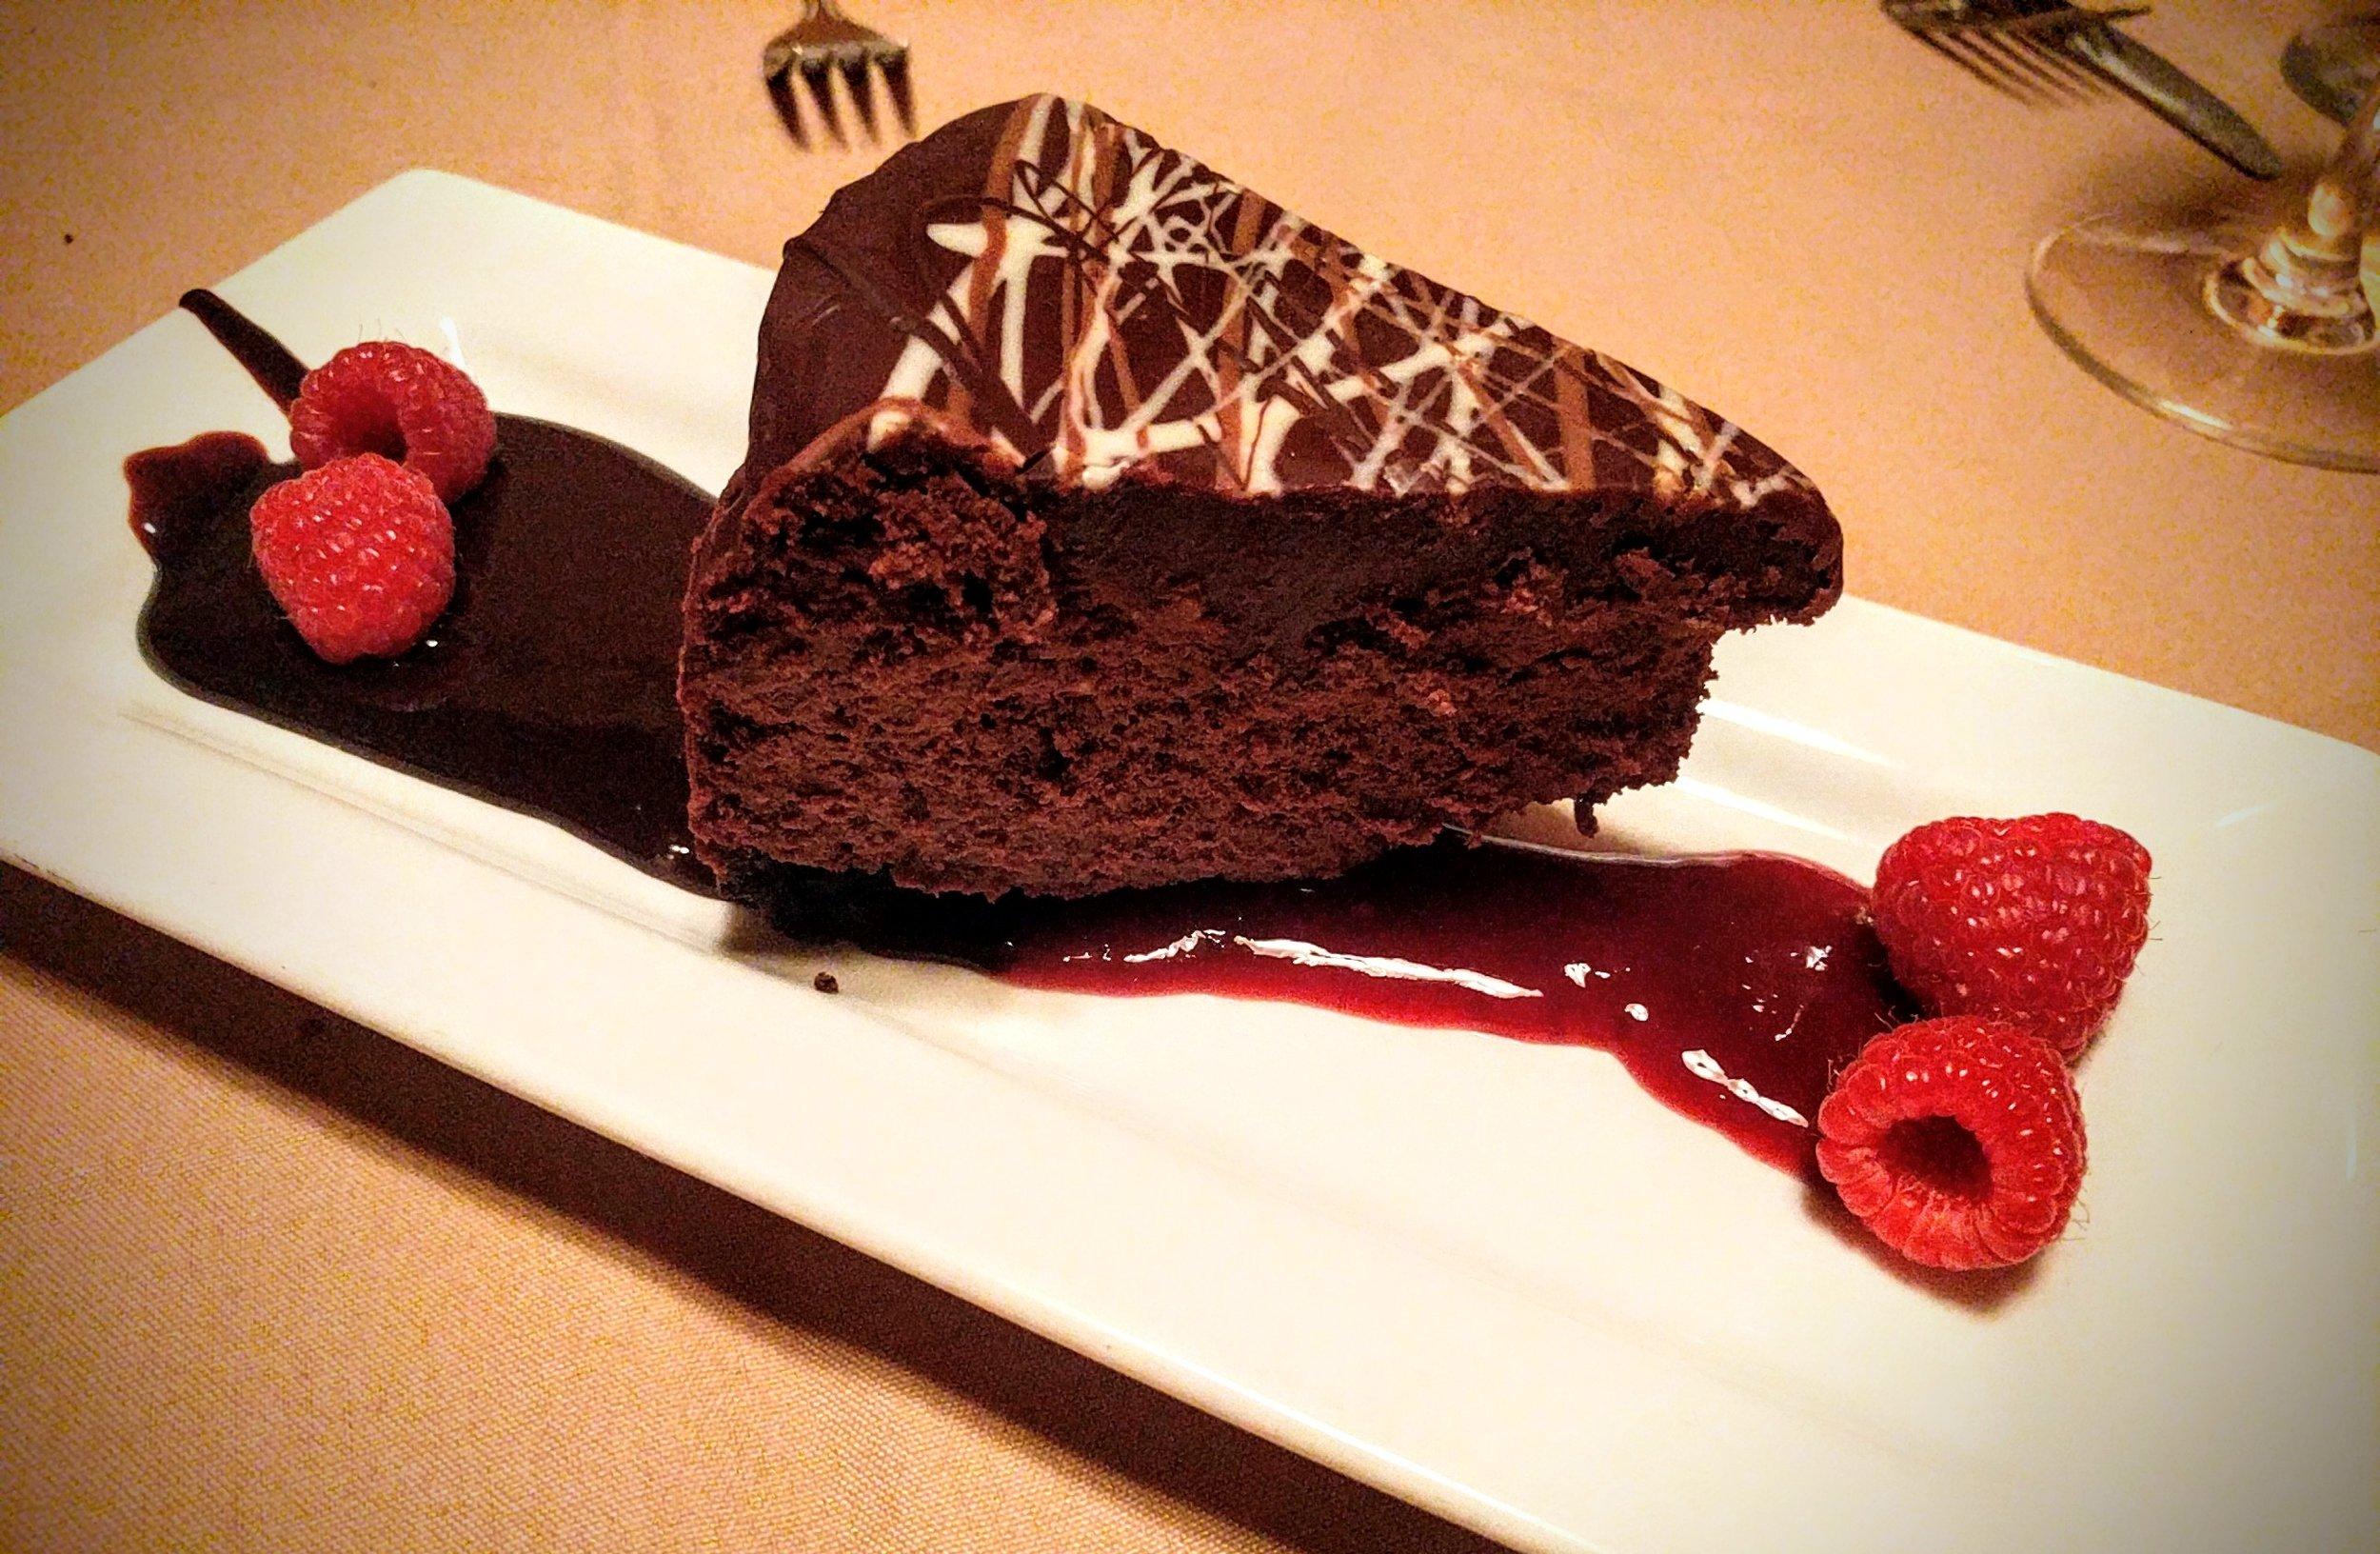 Delicious Triple Chocolate Cake from Silver Fox in Casper, WY.